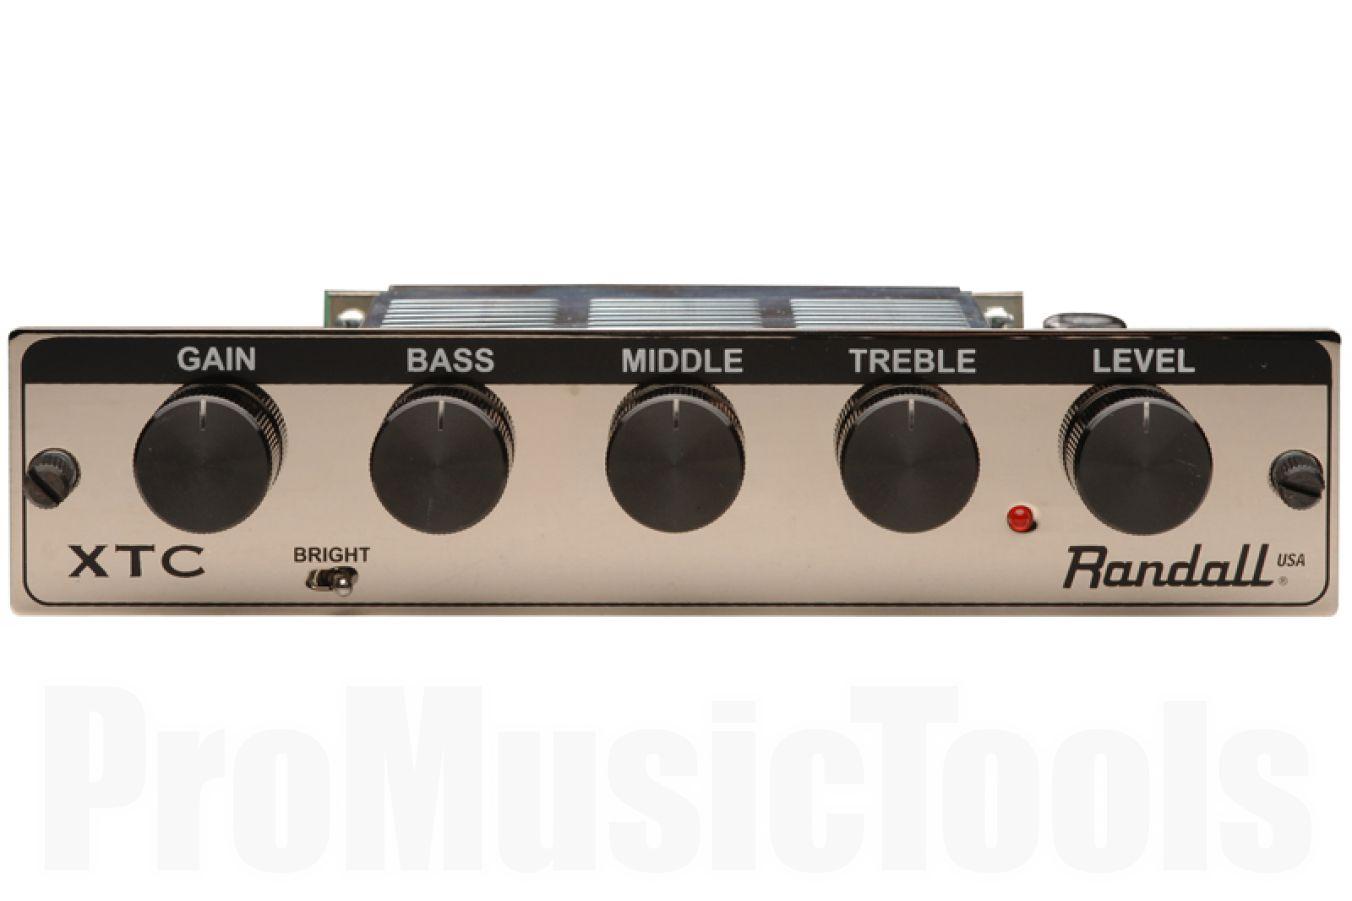 Randall USA XTC MTS guitar amp module